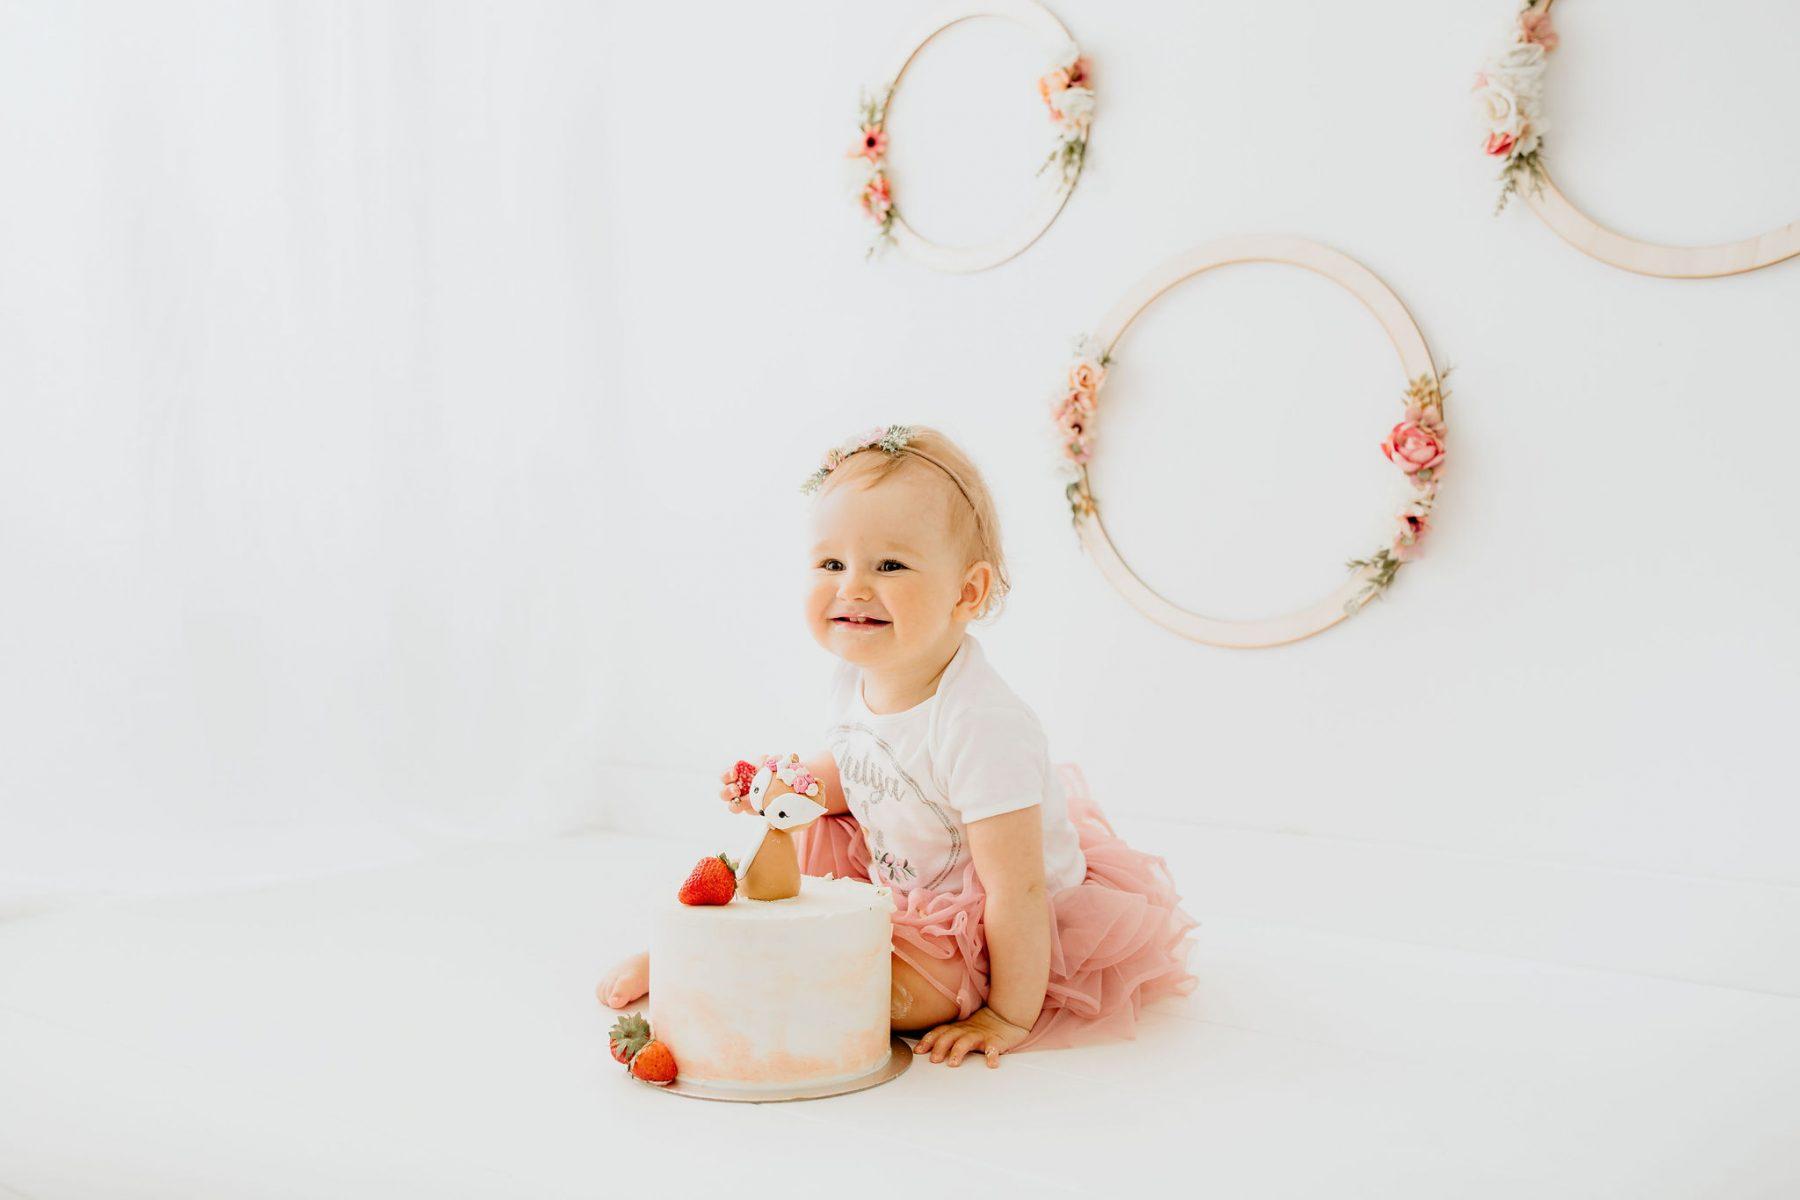 Cake smash J - Luanina pravljica - fotografiranje nosečnic, novorojenckov, druzinic, nosecniska fotografija 0012